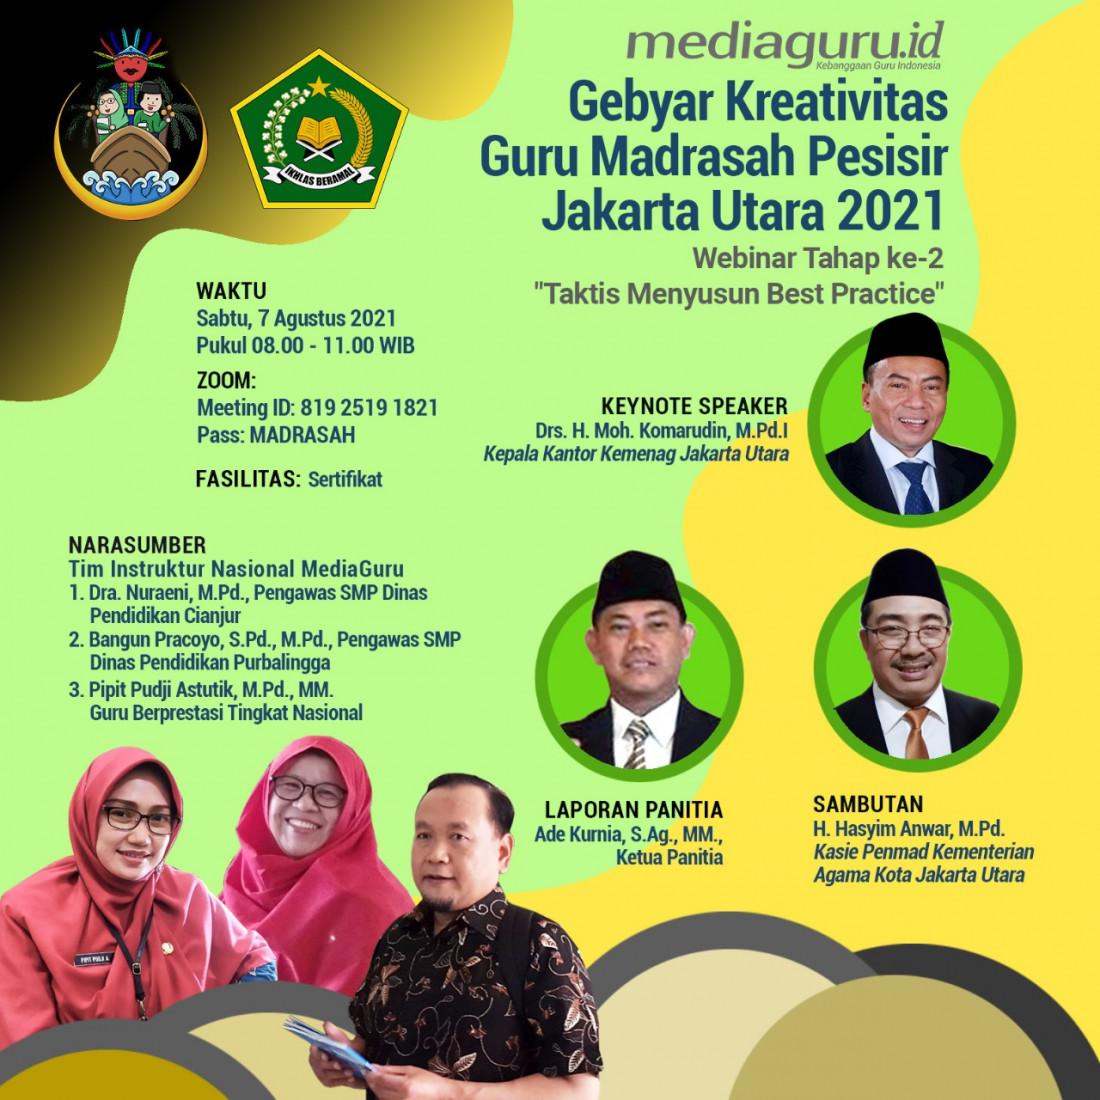 Taktis Menyusun Best Practice tahap ke-2 (Webinar XXXV MediaGuru dan Kemenag Jakarta Utara) - 7 Agustus 2021